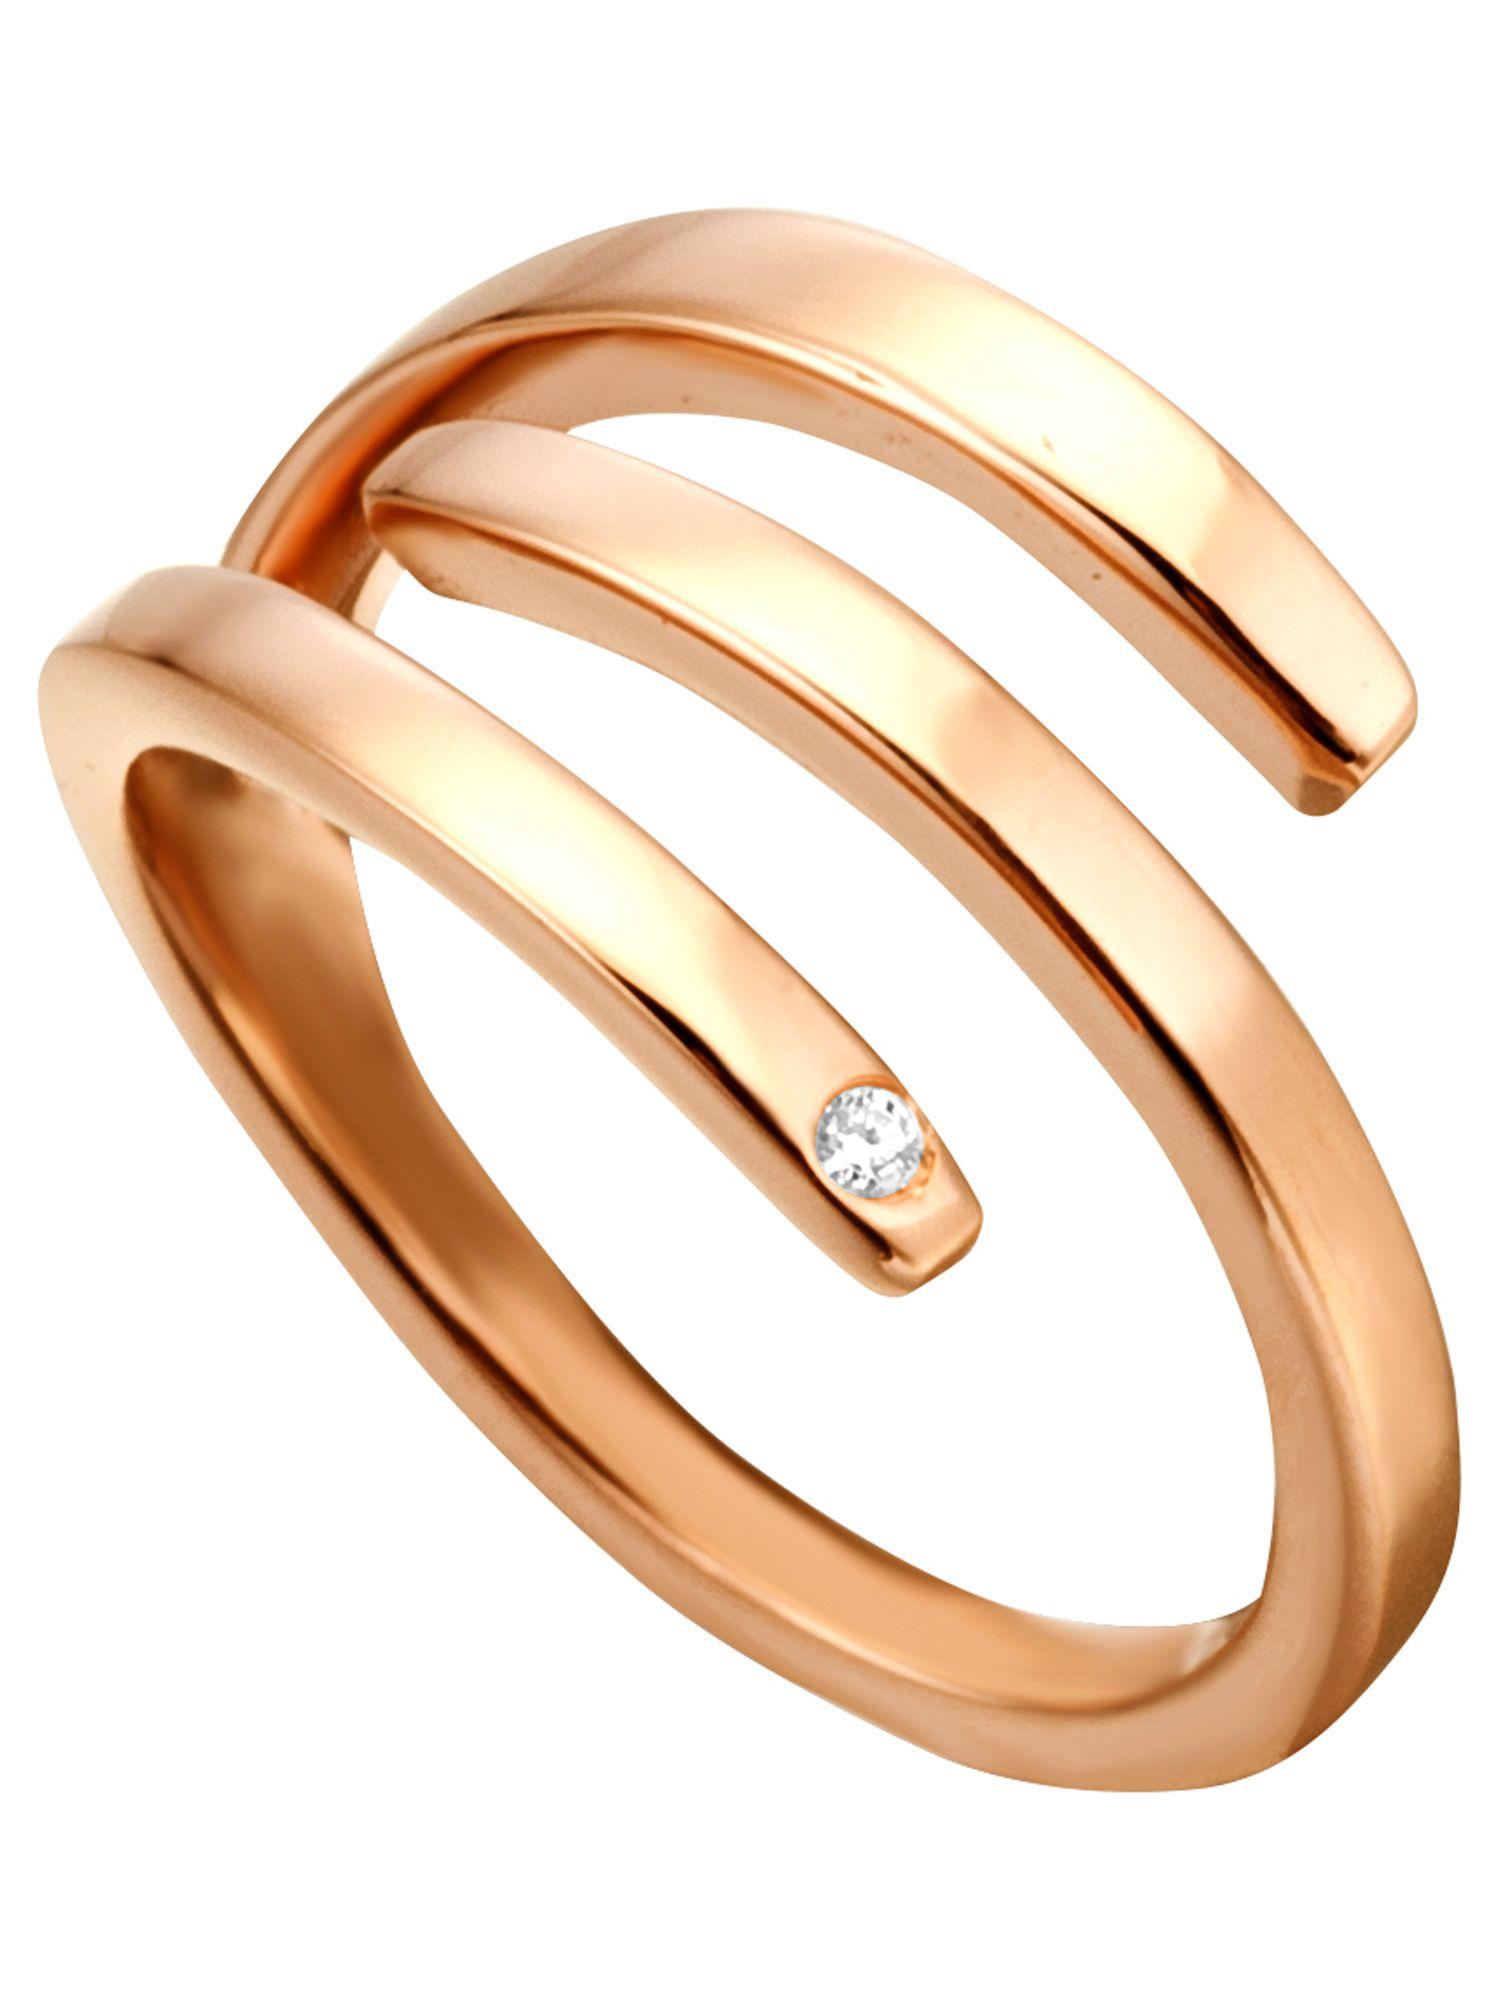 Esprit ESRG00161617 Damen Ring Silber 925 Rose weiß 53 (16.9)